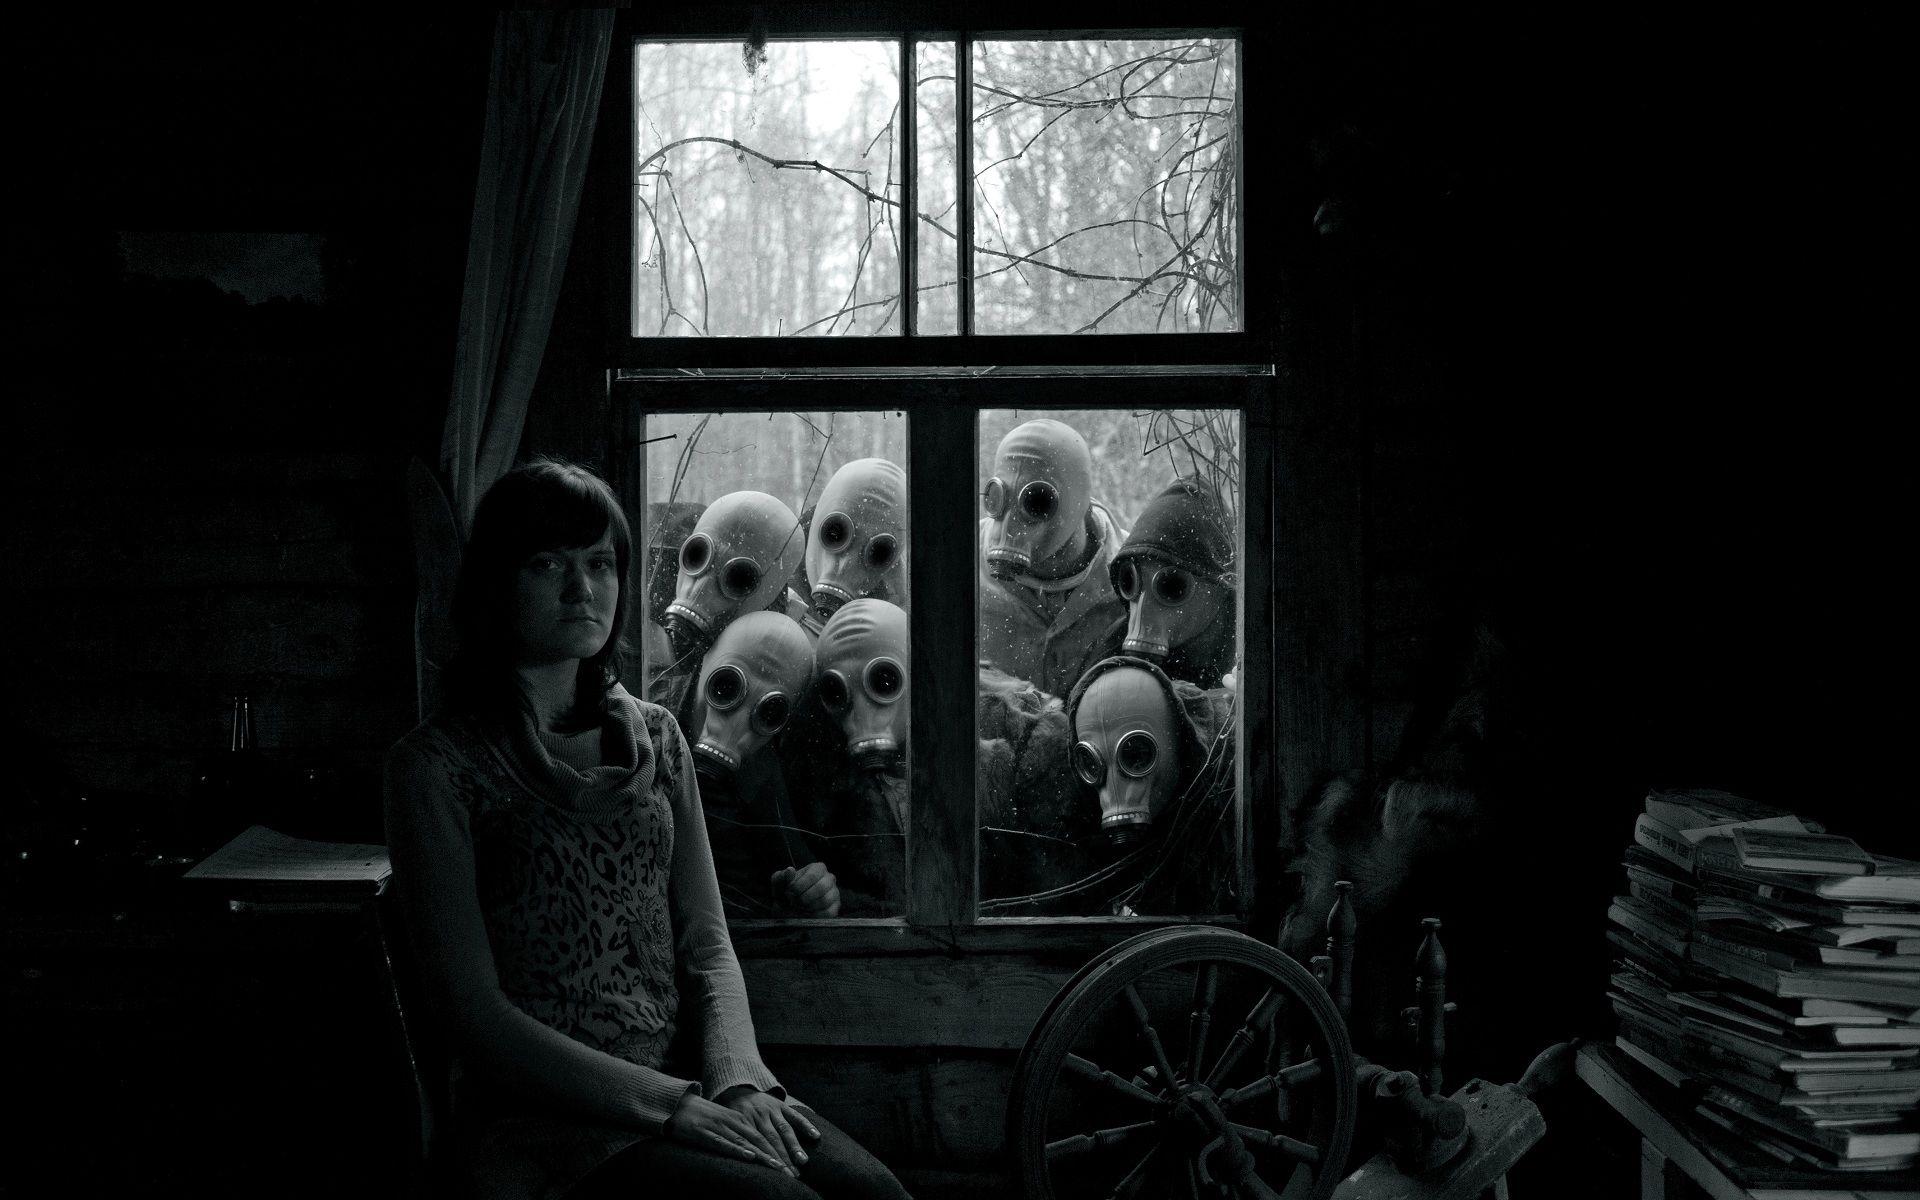 dark creepy basement. Gas Mask Swarm  Creepy PhotographyHorror PhotographyDark Story inspiration and Imagination